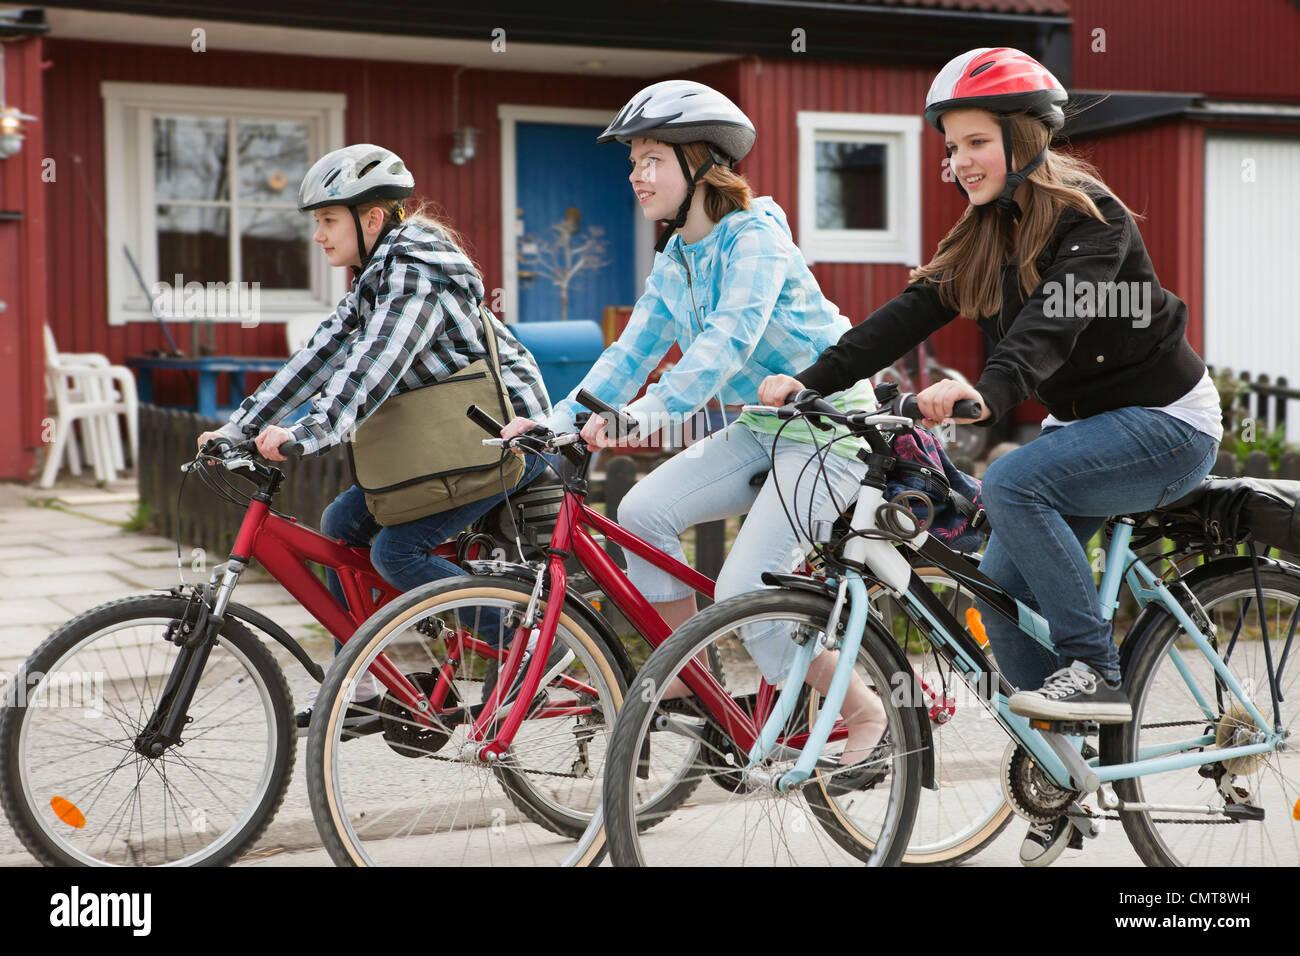 Freunde (12-13) Radfahren gegen Bauwerke Stockbild